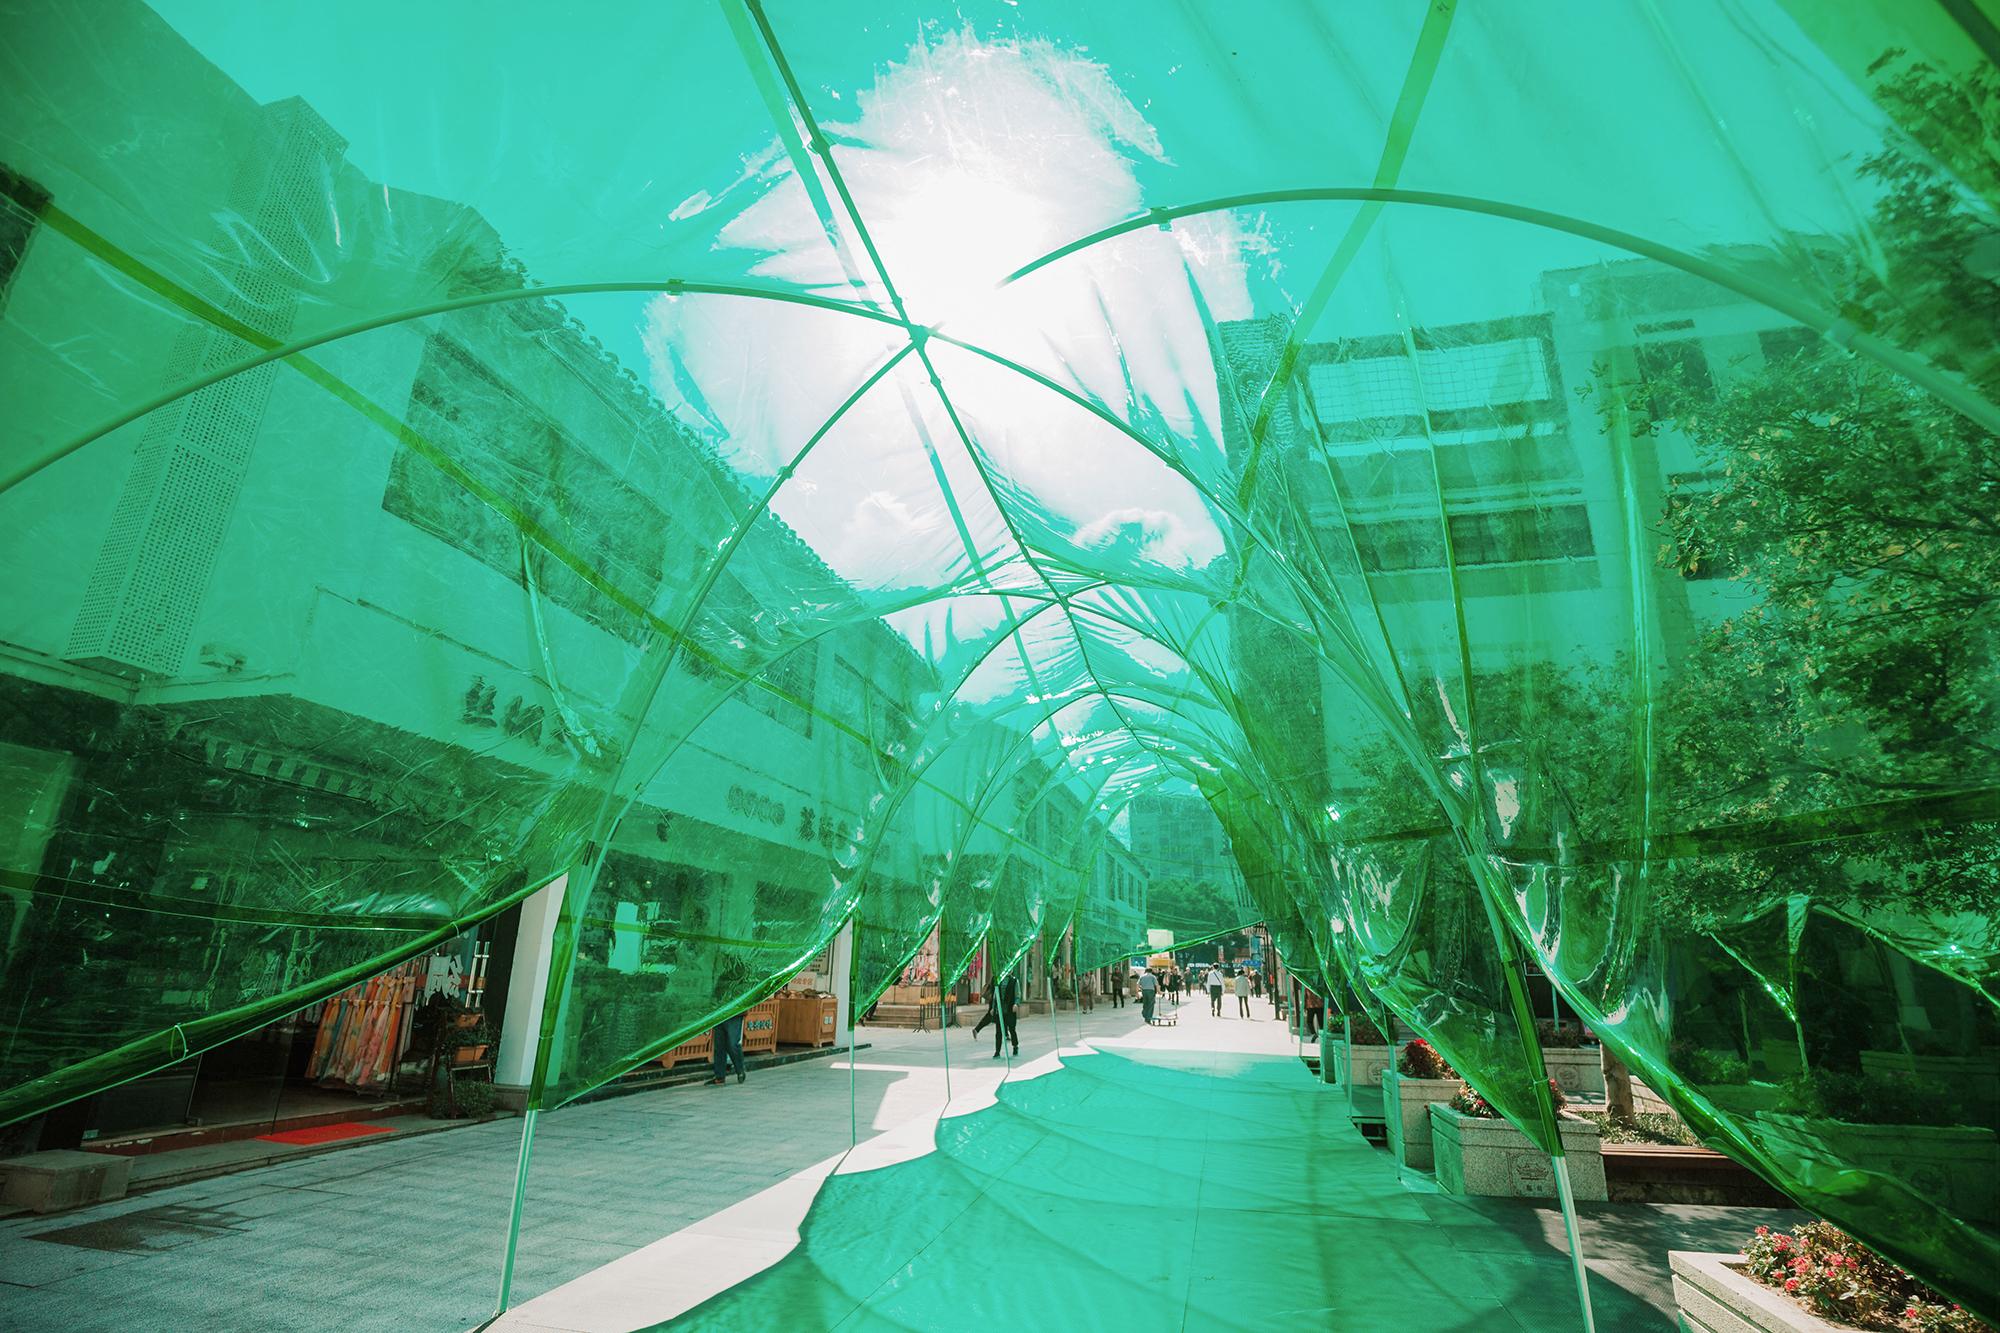 Pergola Tricolor Trilogy: Accordion Arcade, Blue Sky Blues, Orbital Oasis par ATAH, Suzhou, Chine